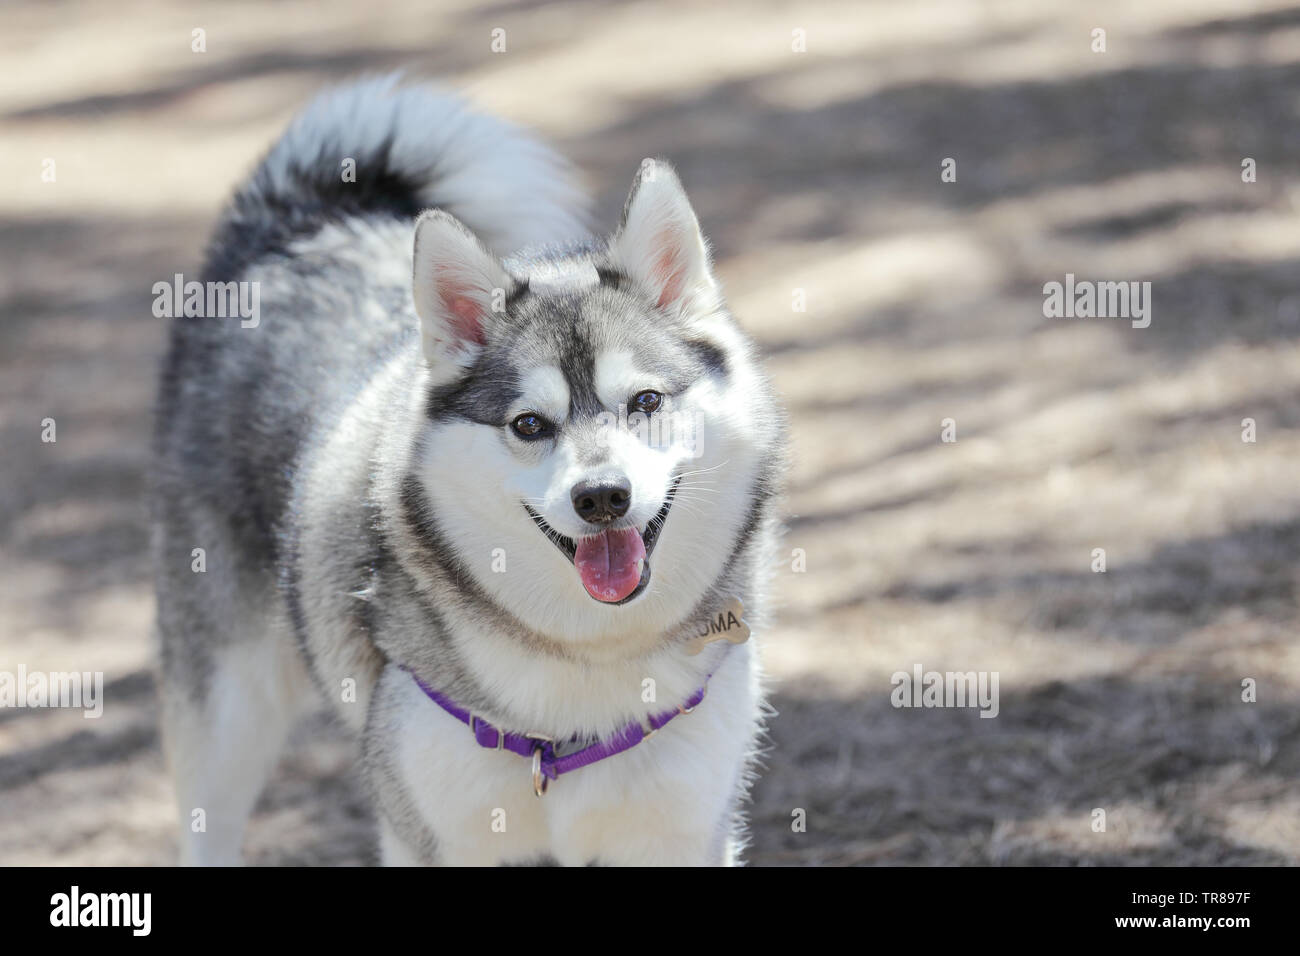 smiling Alaskan Klee Kai at a dog park - Stock Image